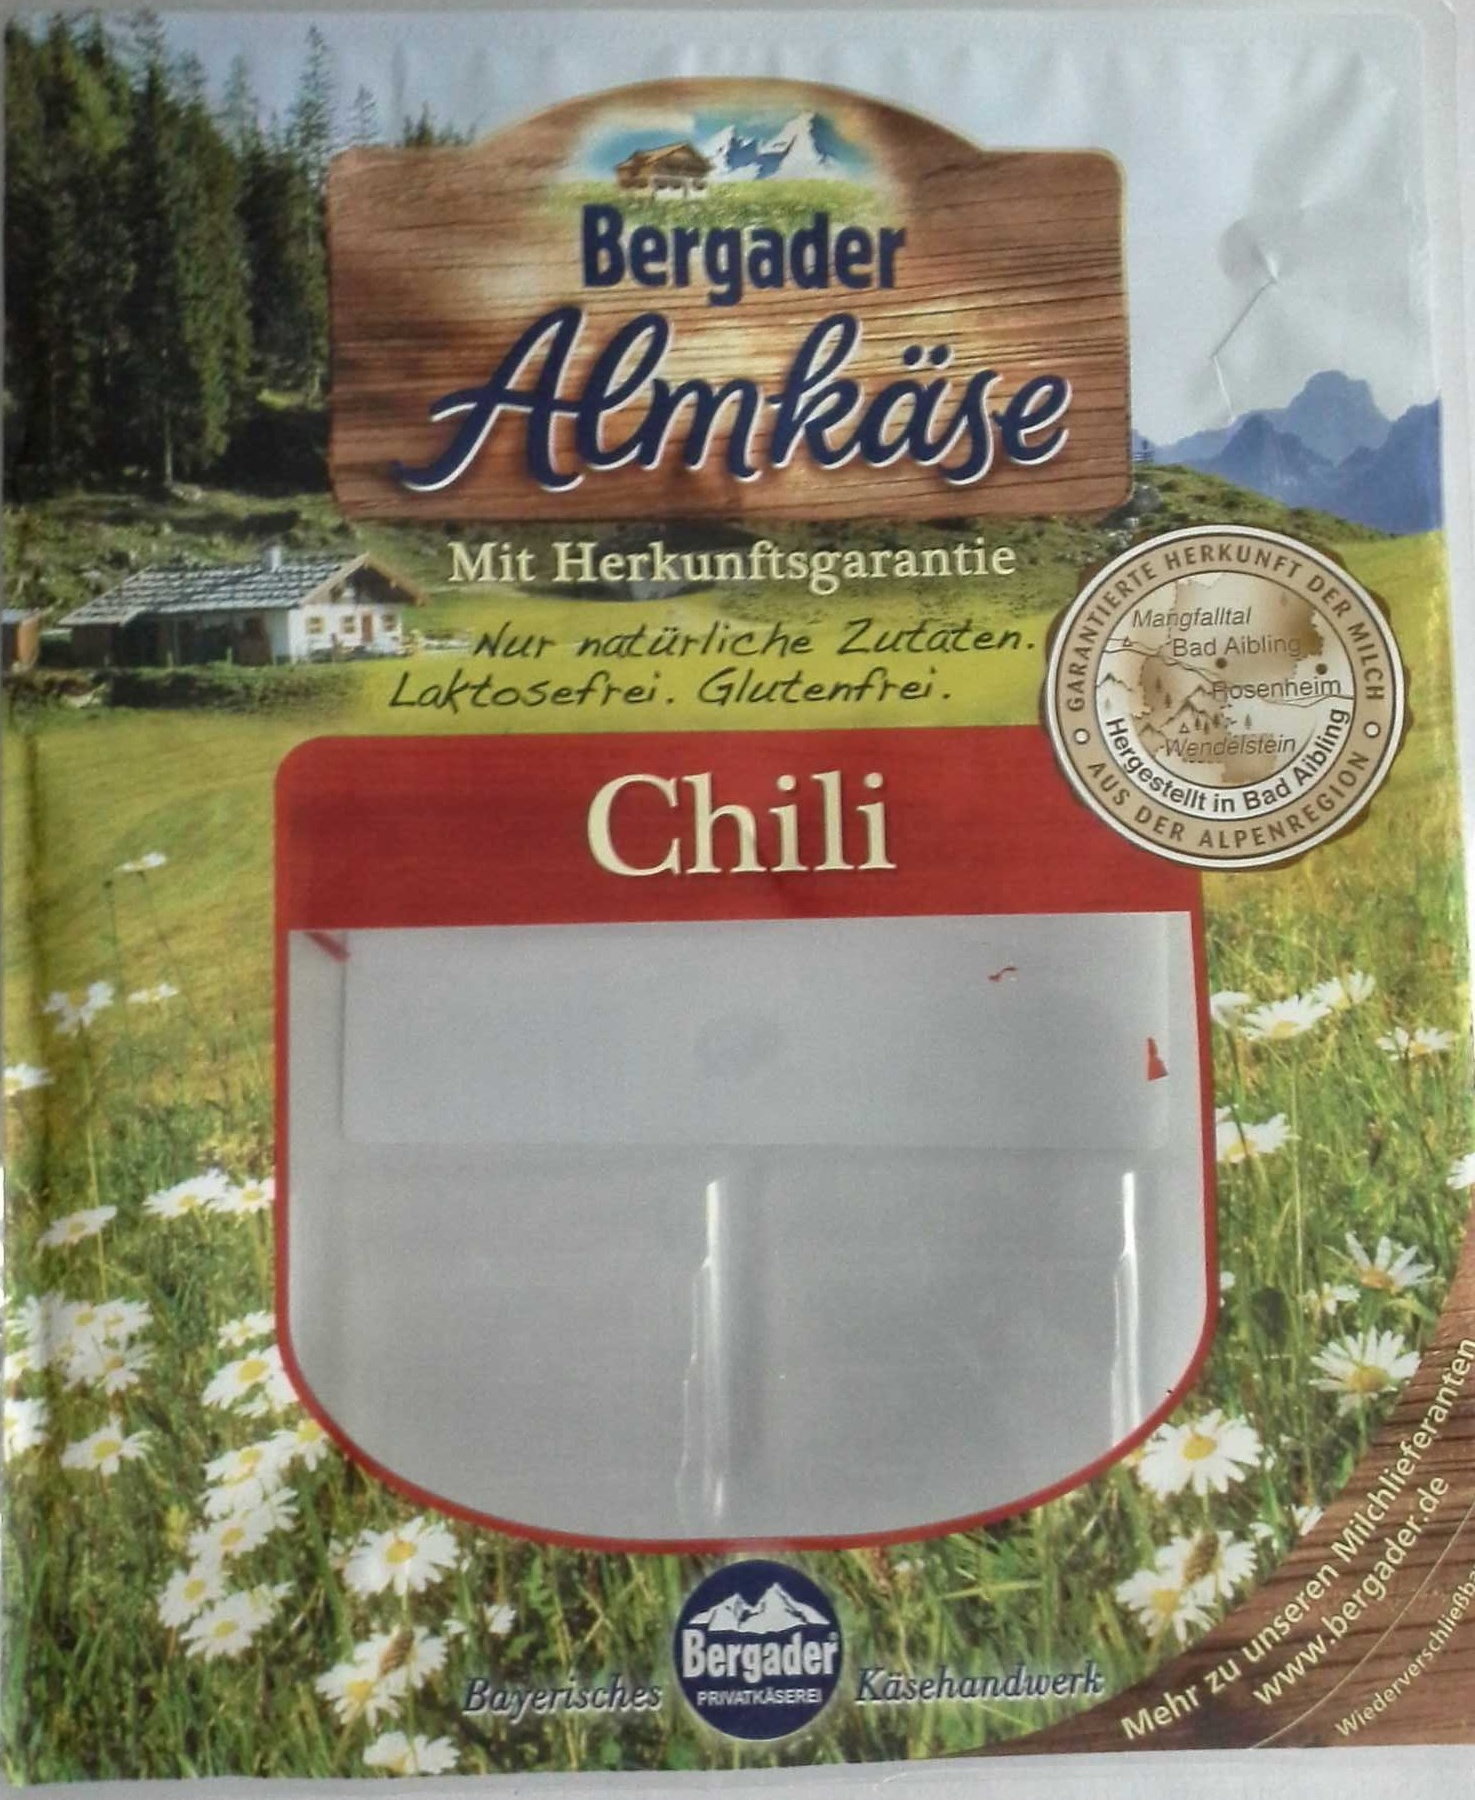 Bergader Almkäse Chili - Product - de